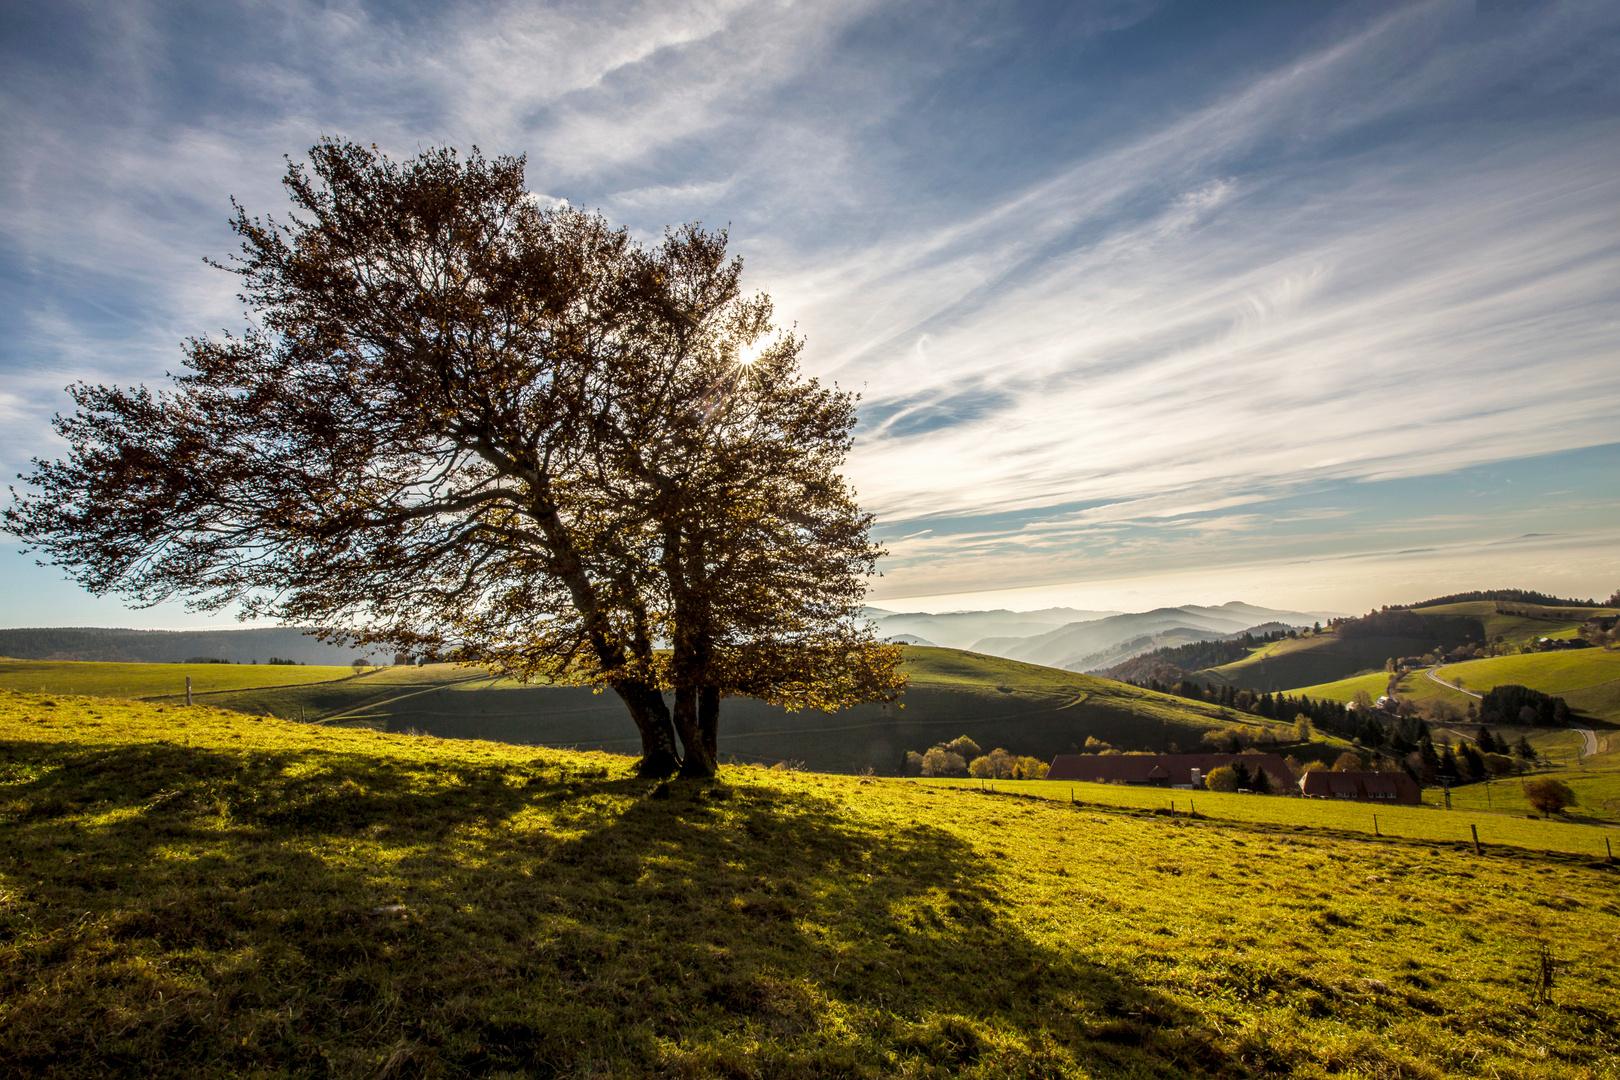 Schauinsland Baum